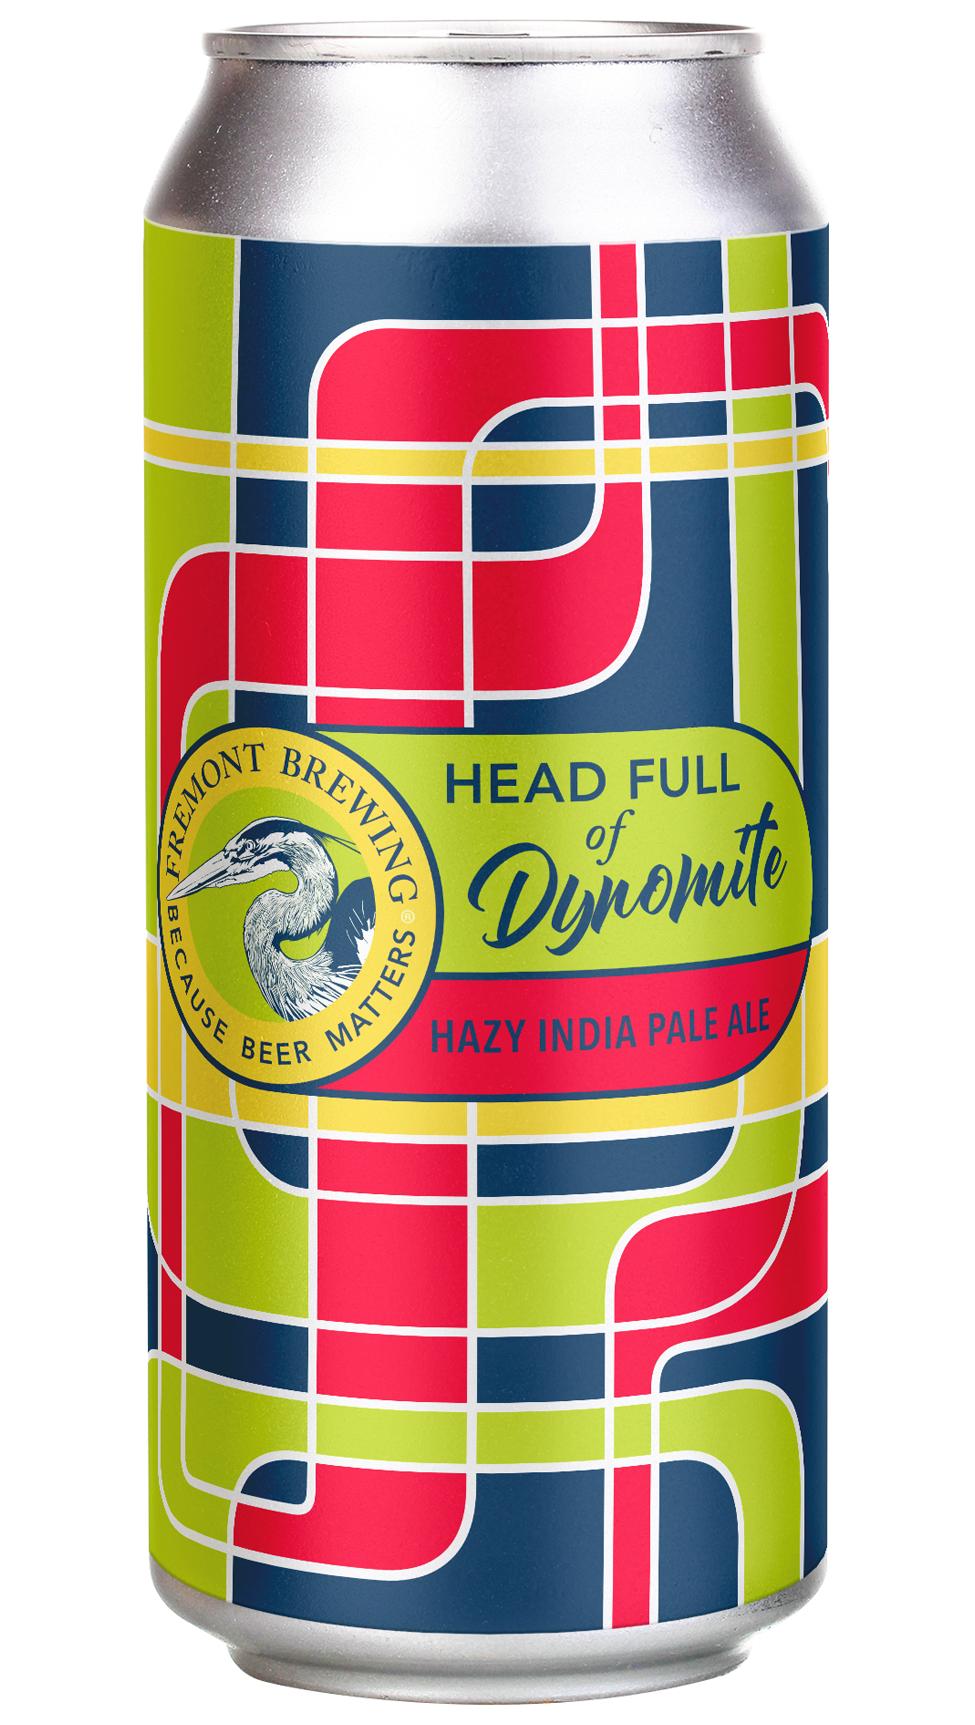 Head Full of Dynomite v.9